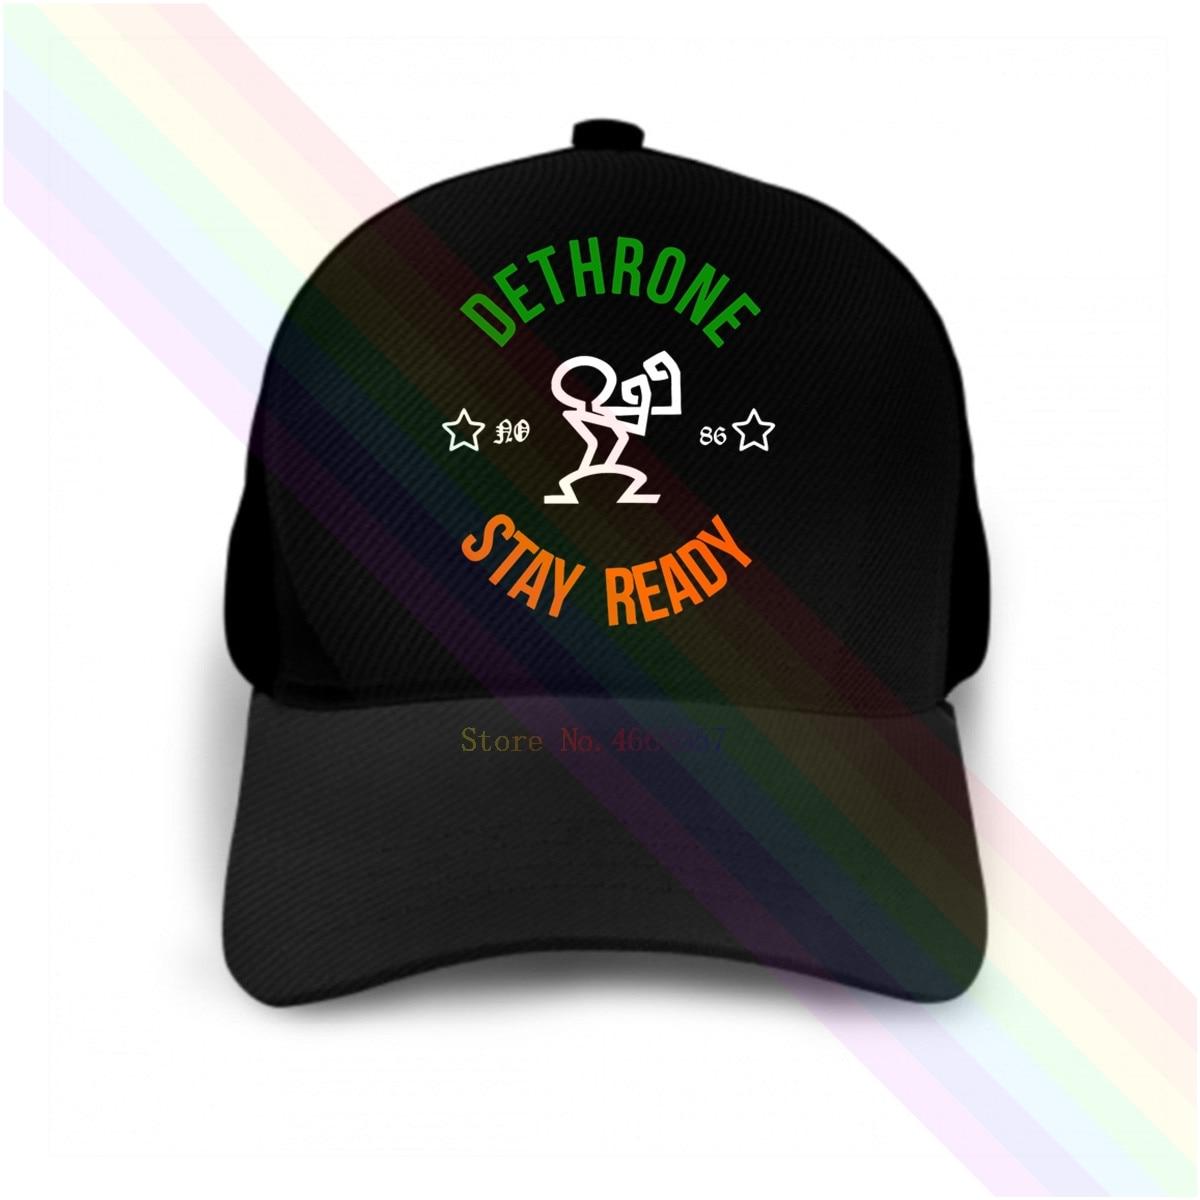 New Fashion Dethrone Conor Mcgregor Dublin Walk Out 2020 Newest Black Popular Baseball Cap Hats Unisex Discounts Sale